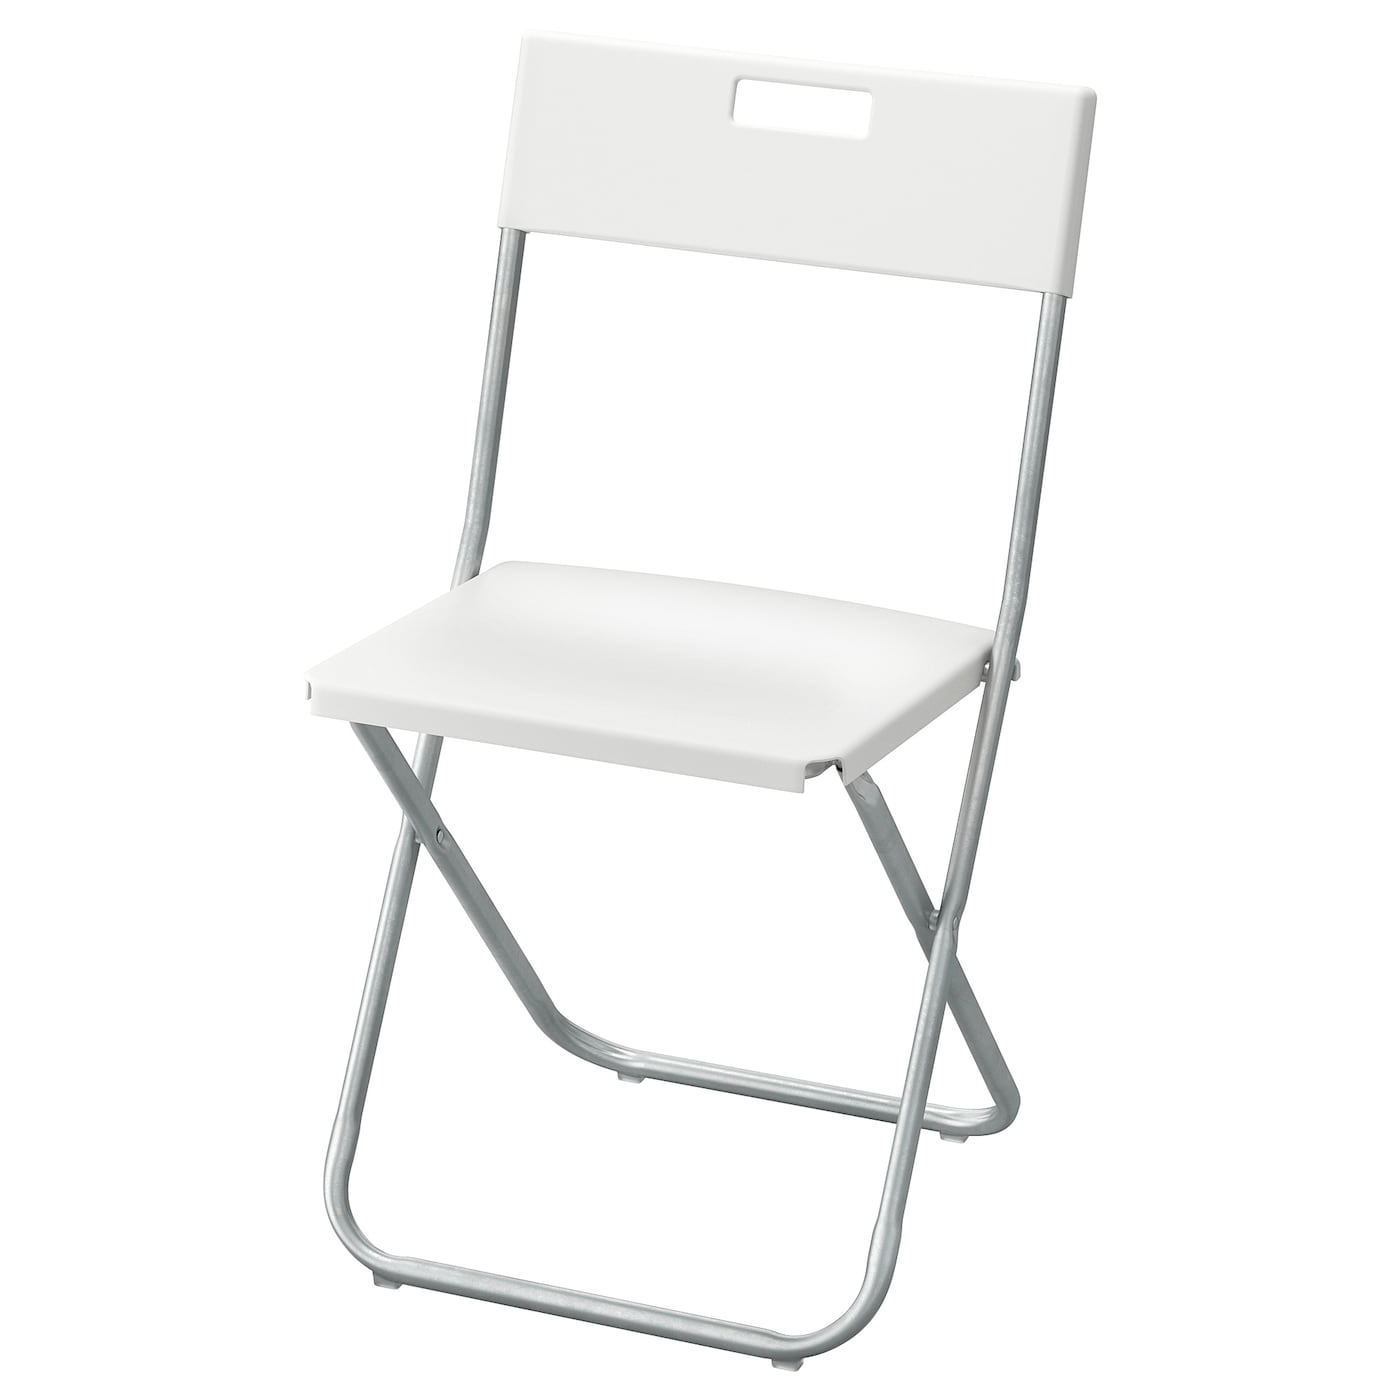 GUNDE Folding chair - white